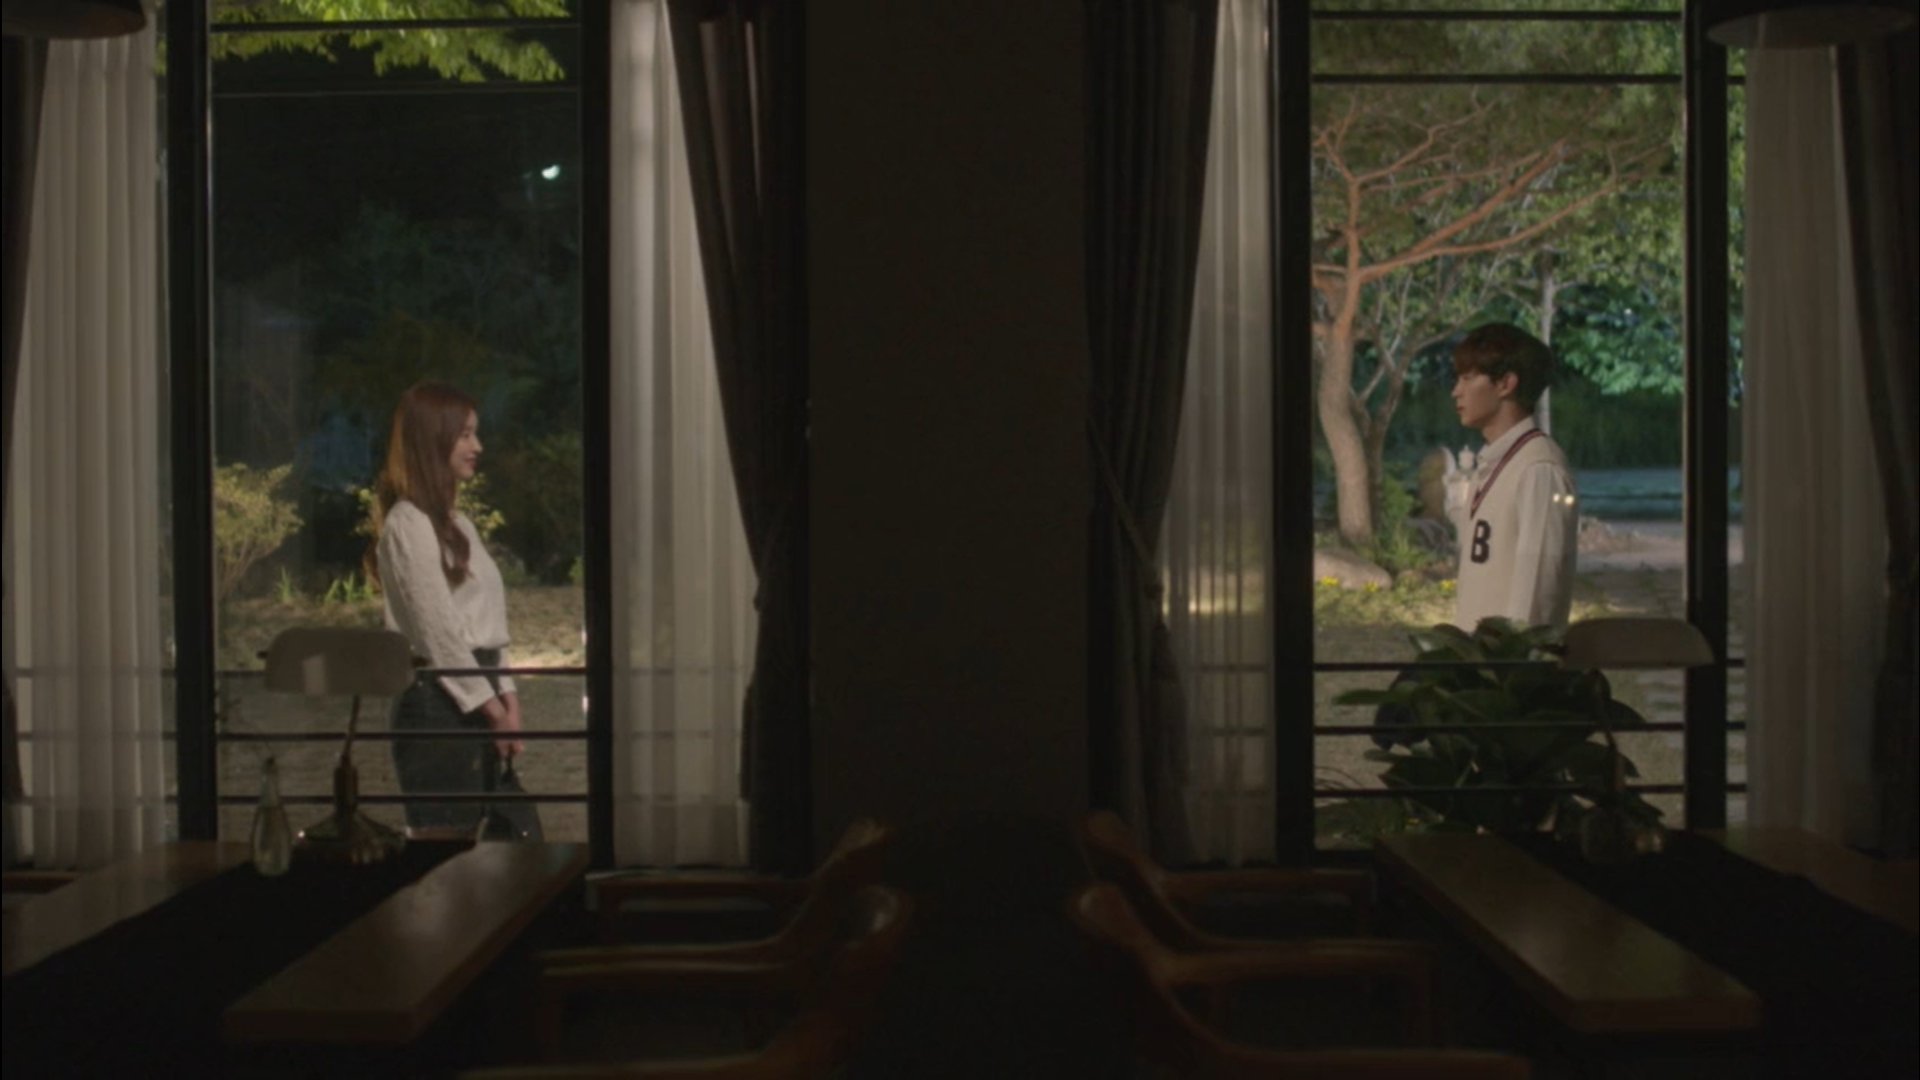 Wednesday 3:30 PM Yoon Jae-won runs into Gong Na-yeon